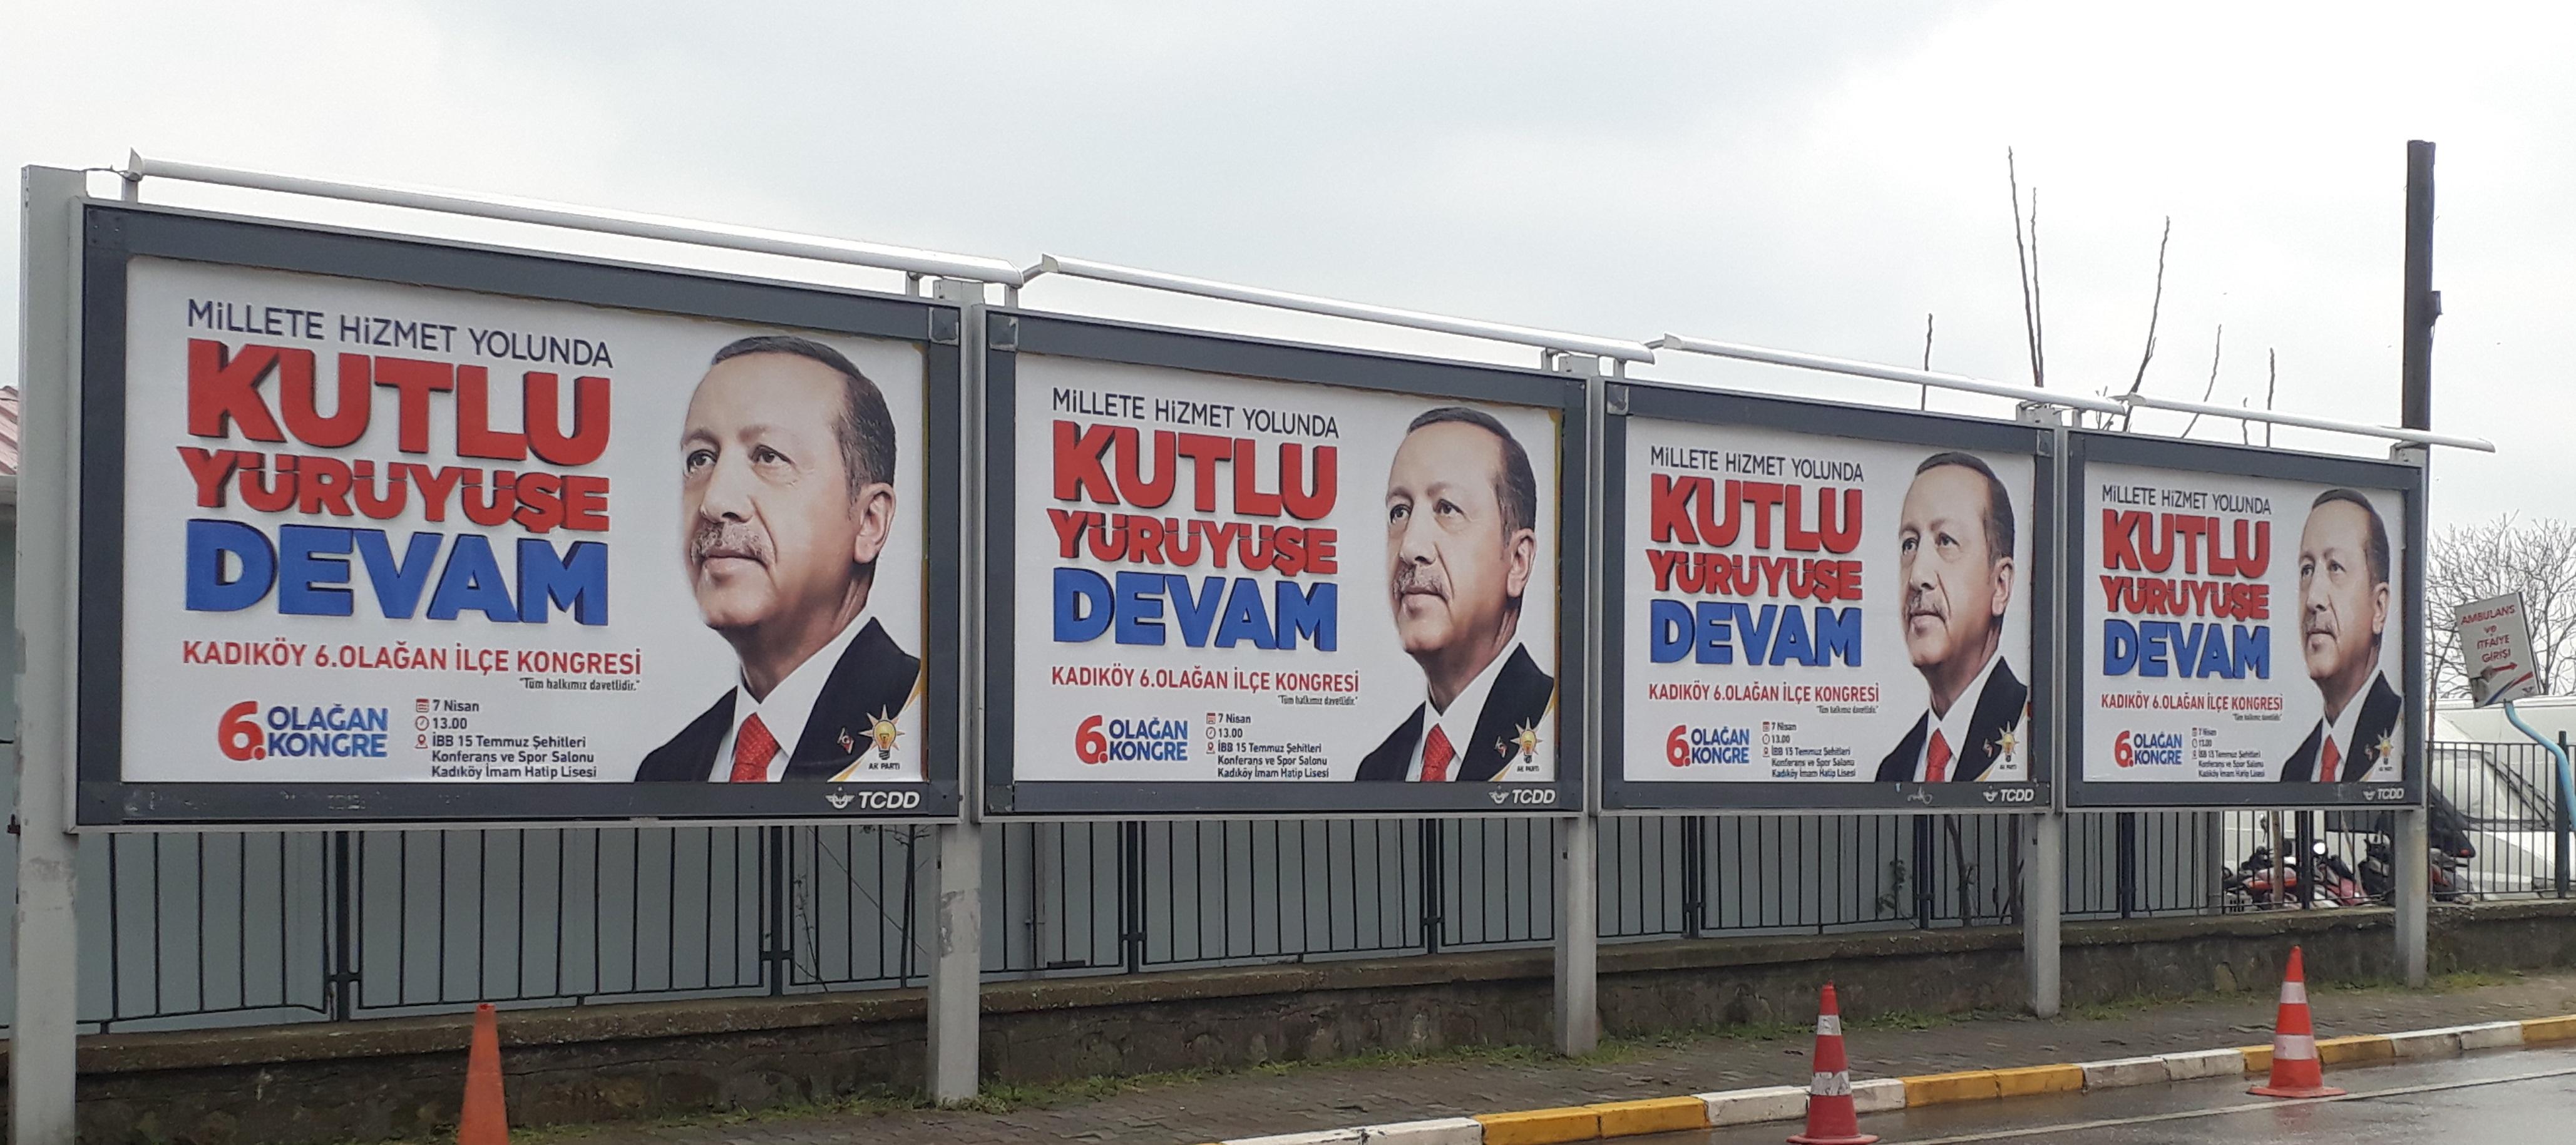 Erdoganin julisteita